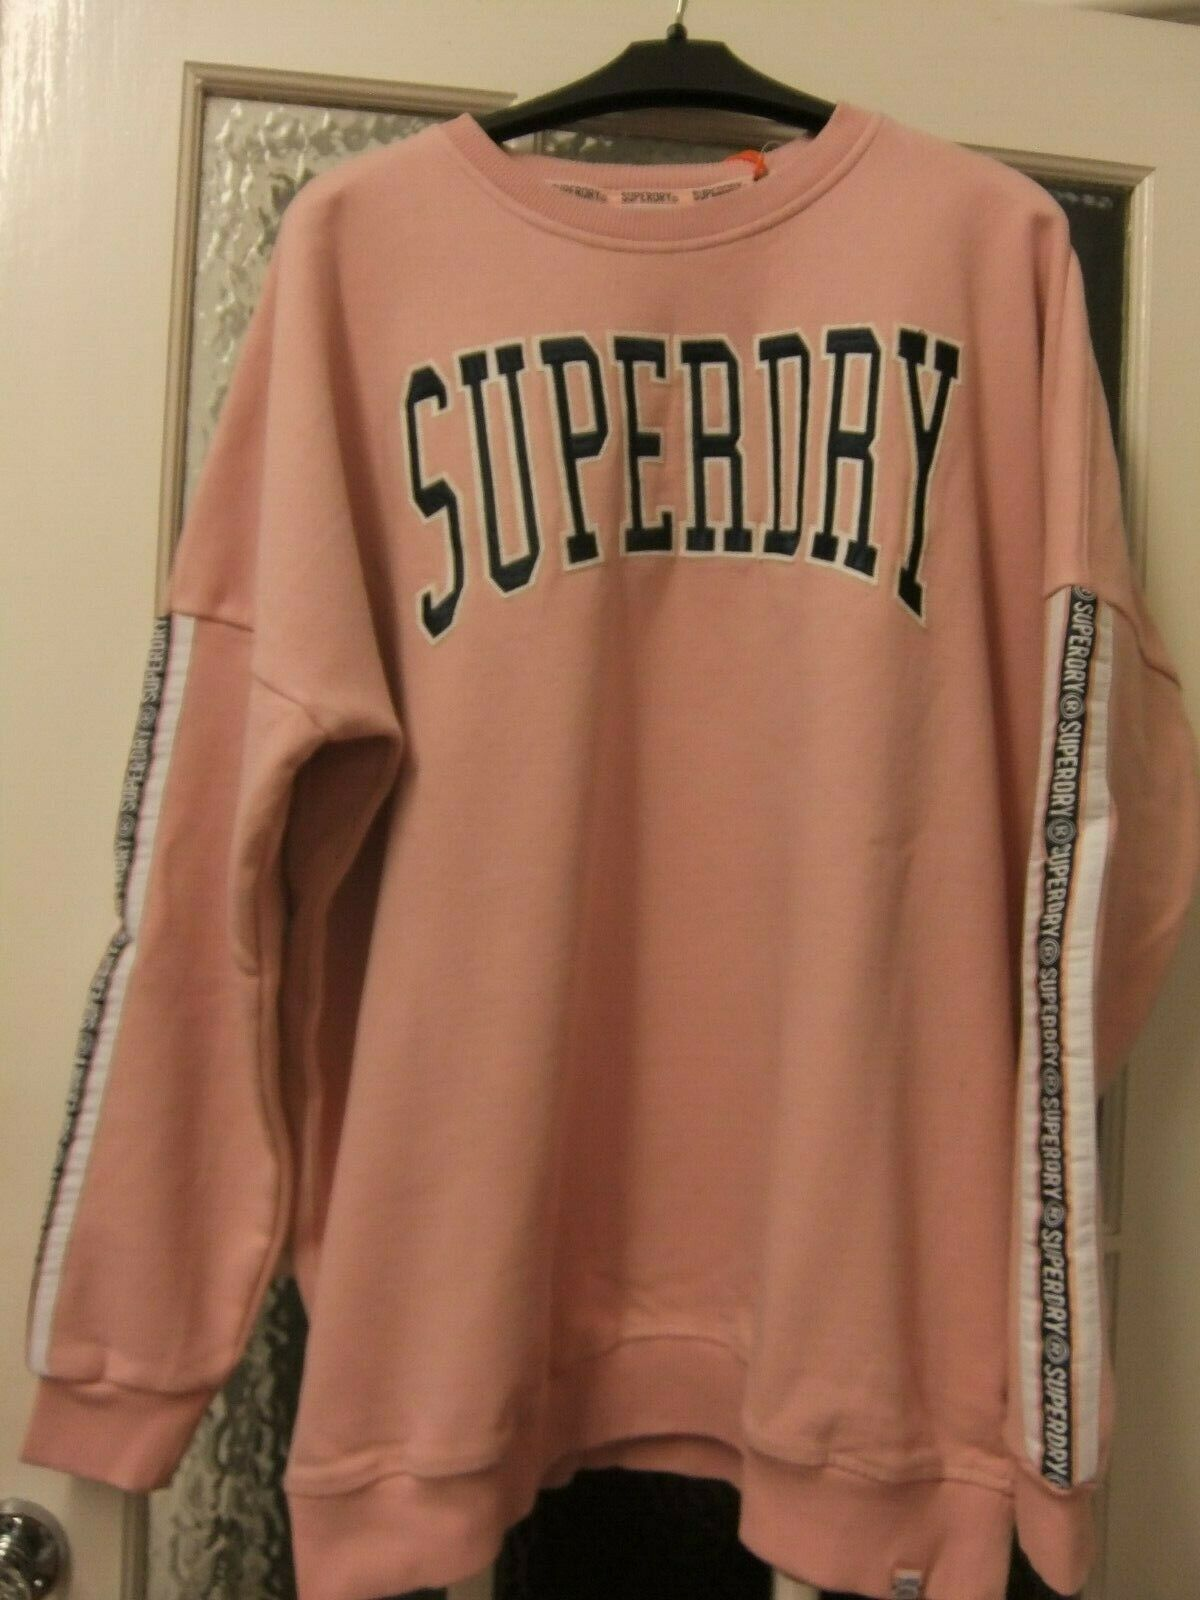 Nice pink sweatshirt to fit size 12.